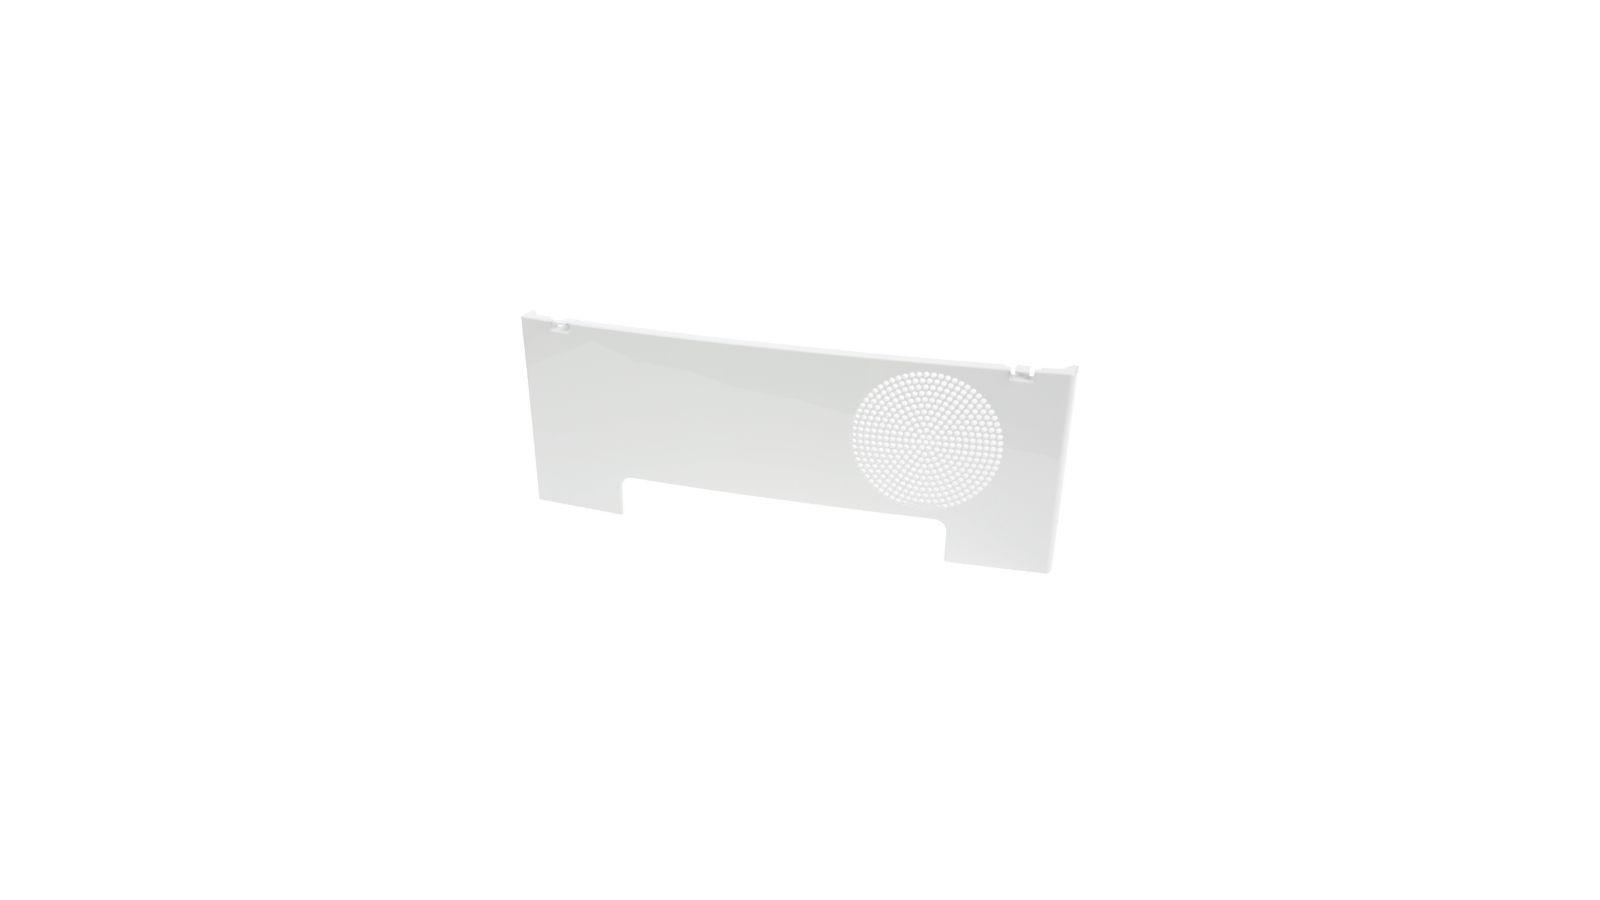 Krytka do sušičky Bosch / Siemens - 00740888 BSH